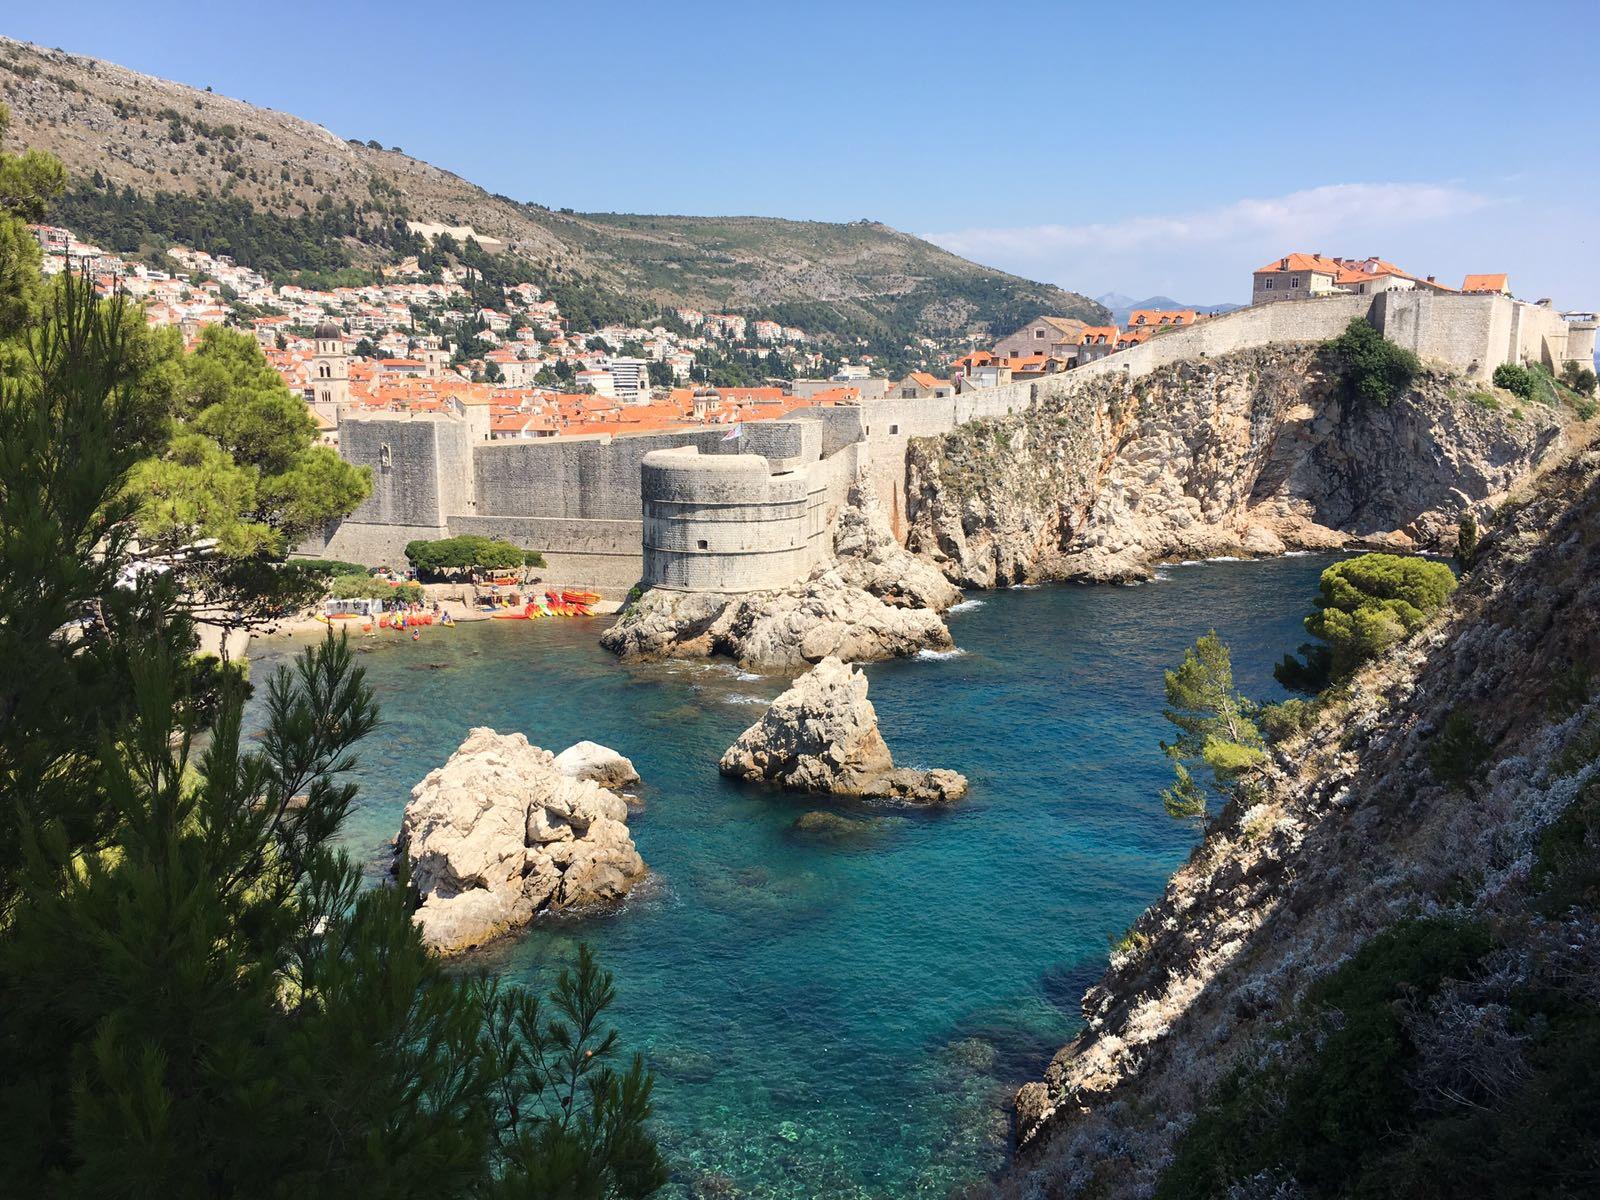 Visite de Dubrovnik: la perle de l'Adriatique!